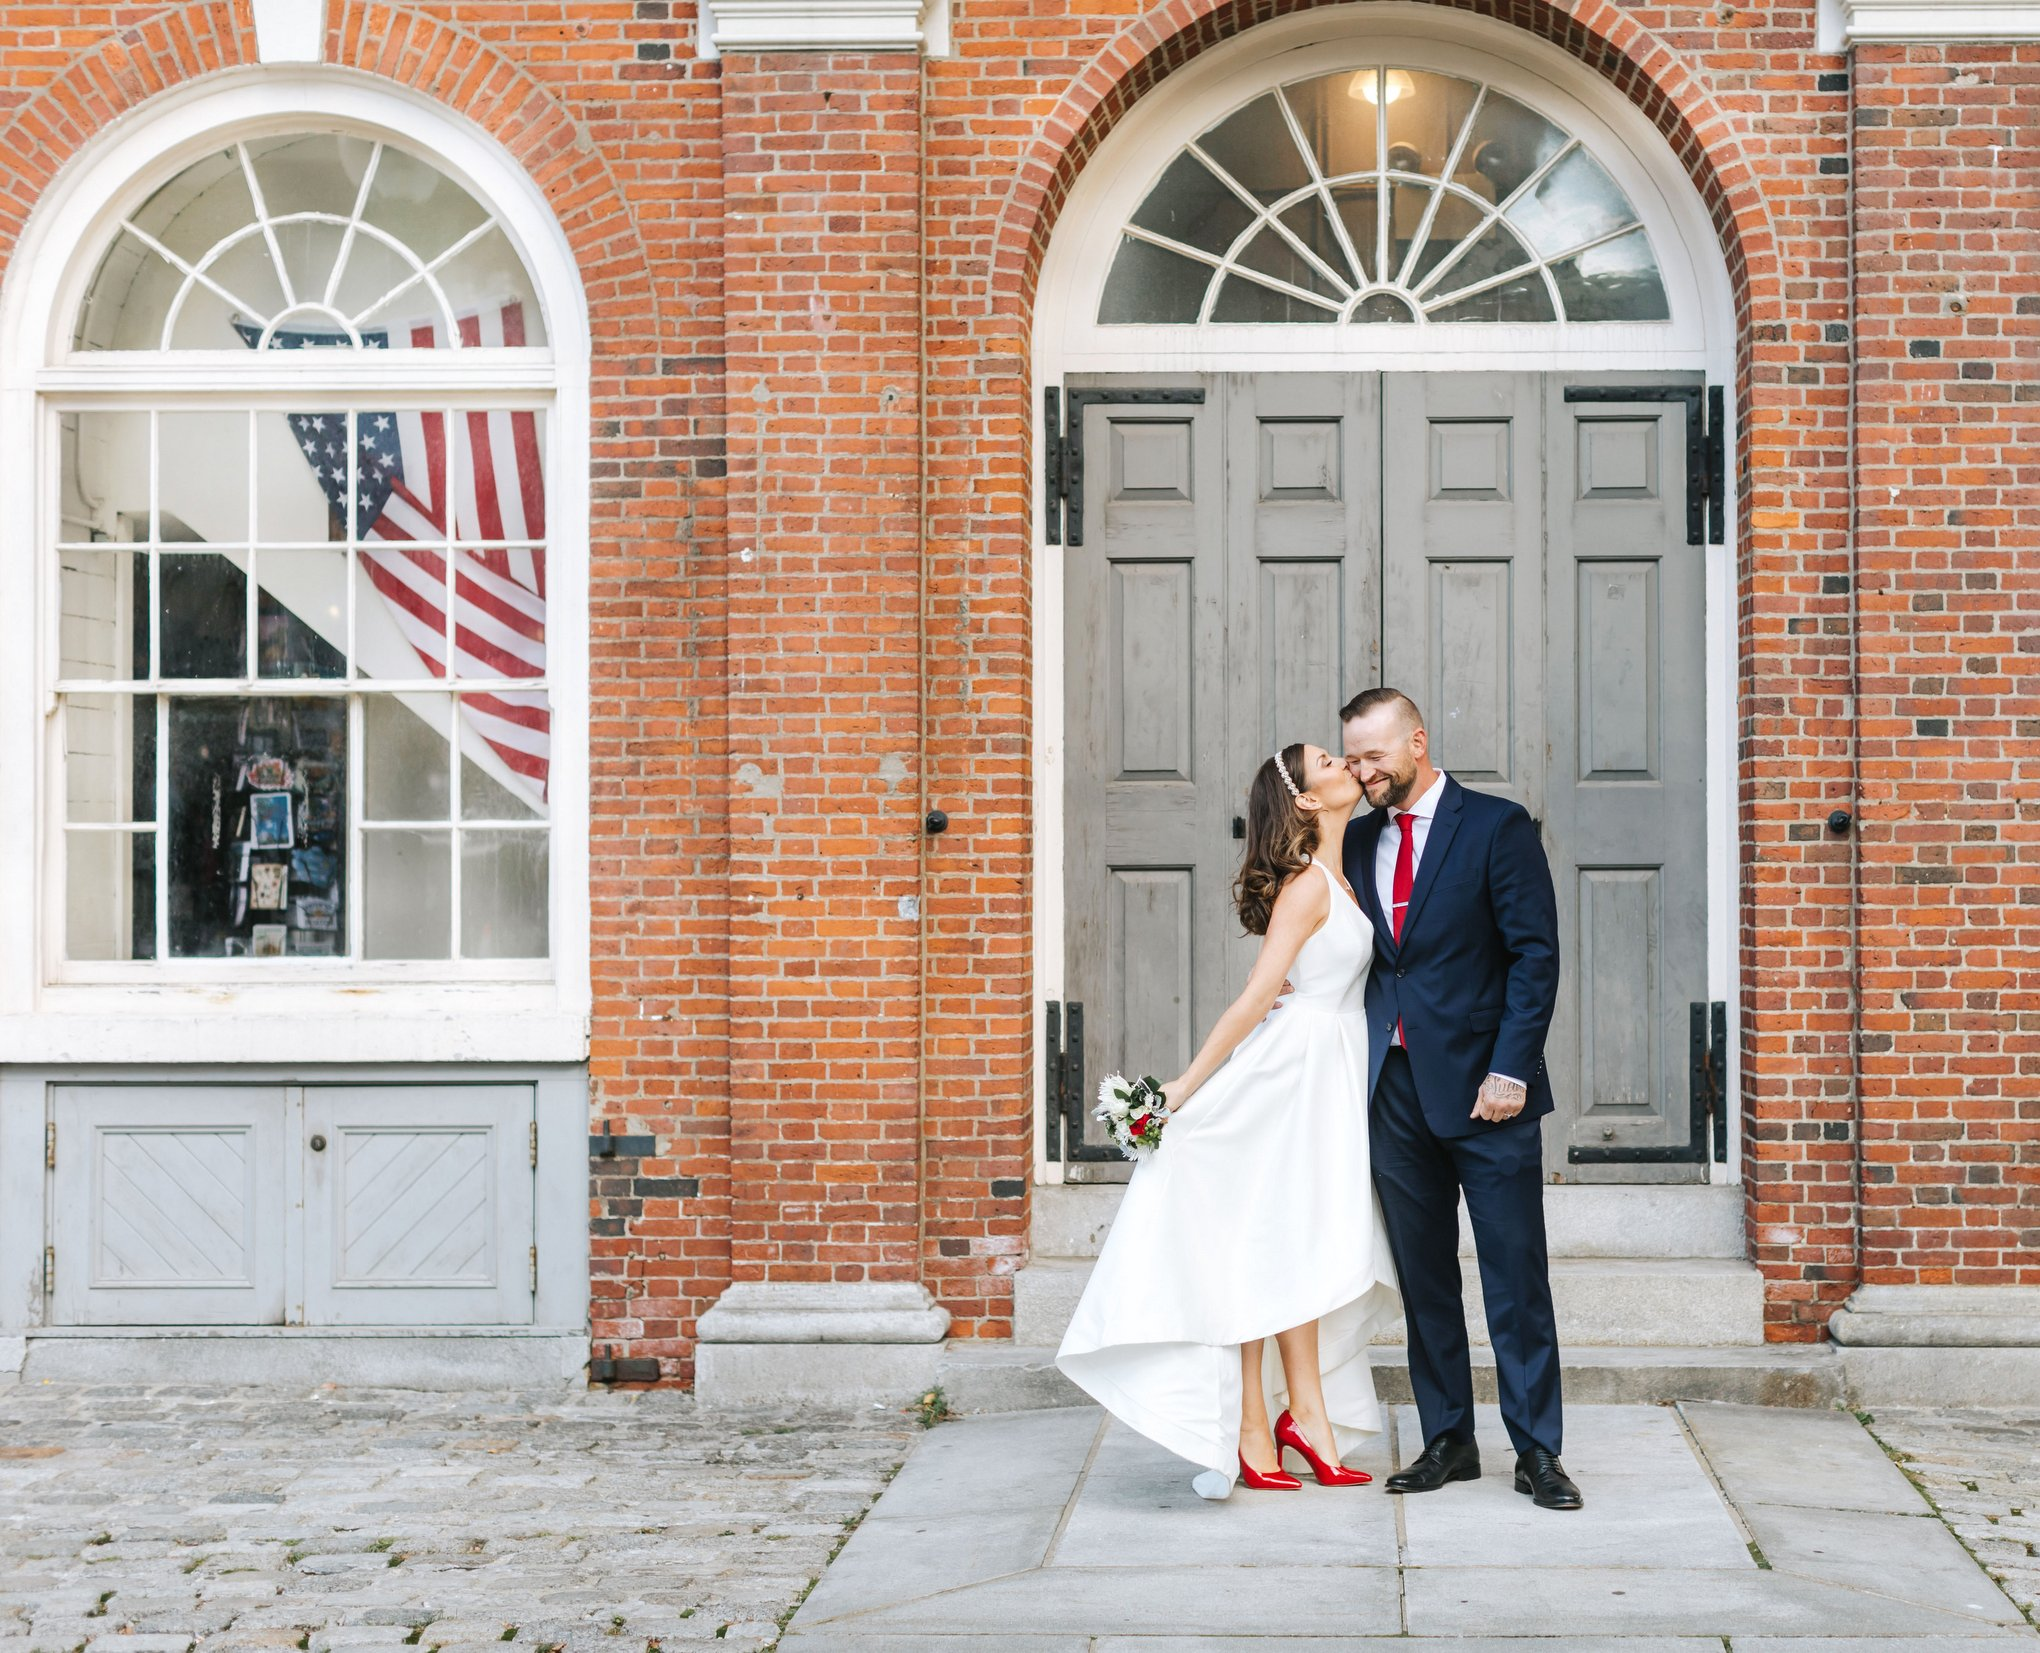 Boston-City-Hall-Wedding-Elopement-Photographer-Lena-Mirisola-9.JPG